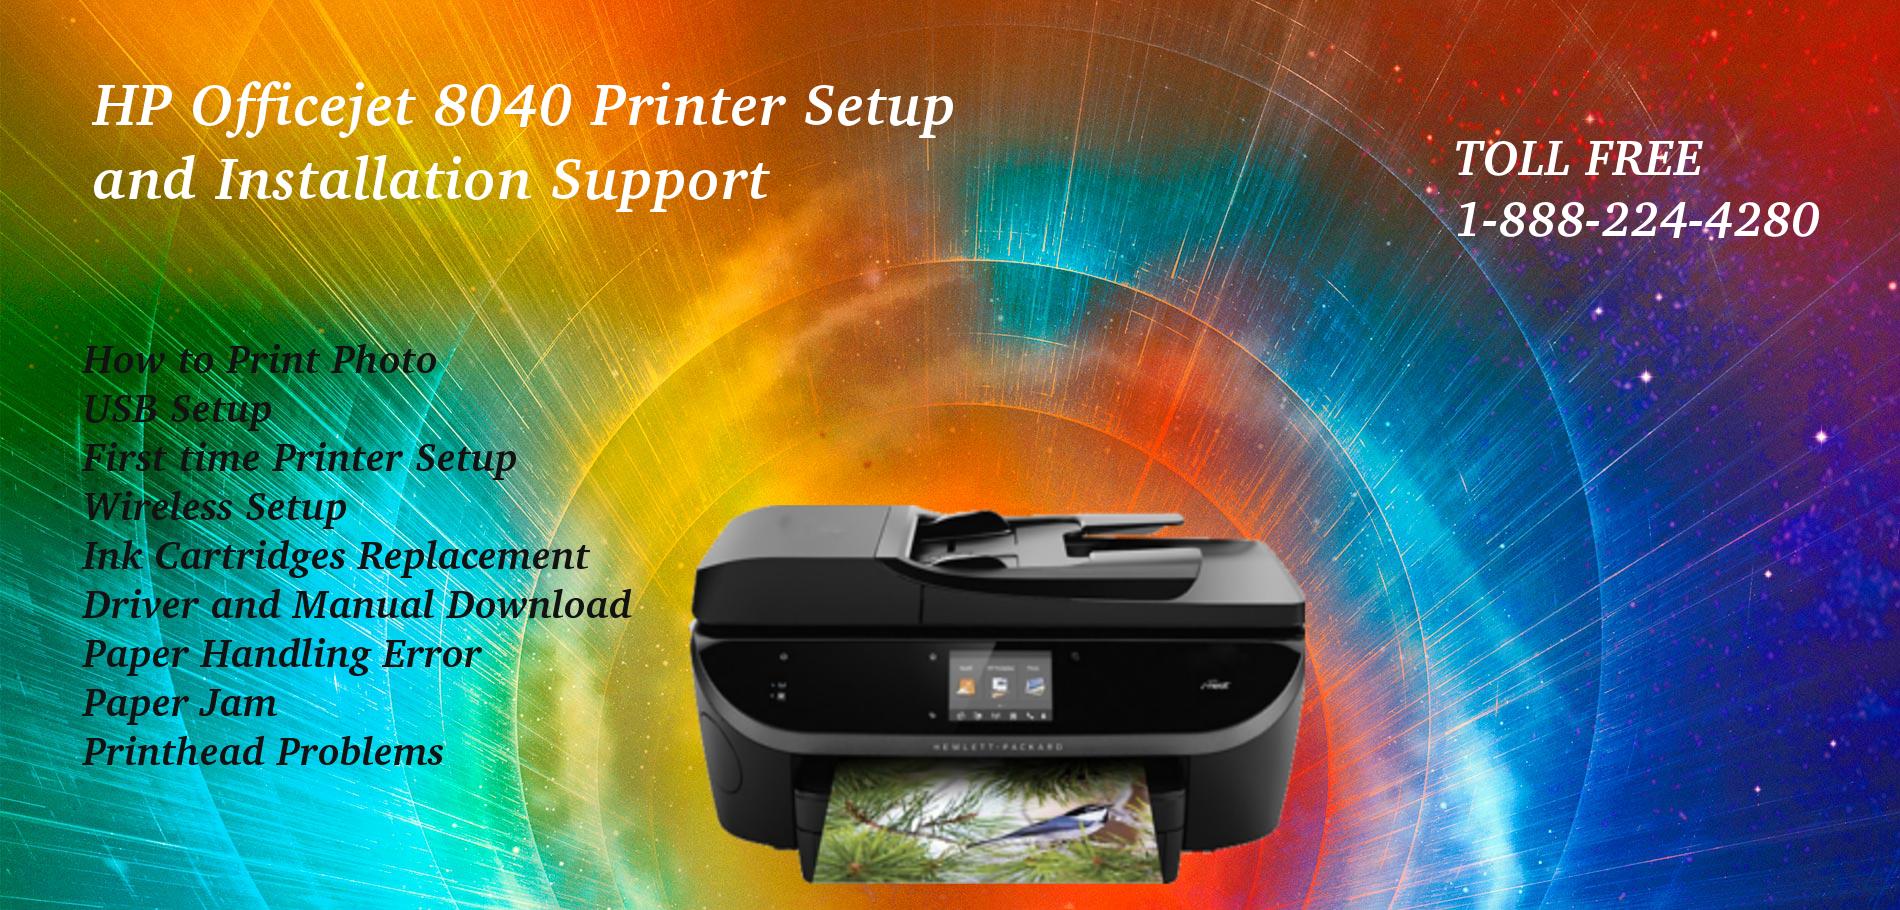 123 Hp Com Oj8040 Quick Hp Officejet 8040 Printer Setup Hp Officejet Printer Paper Handling